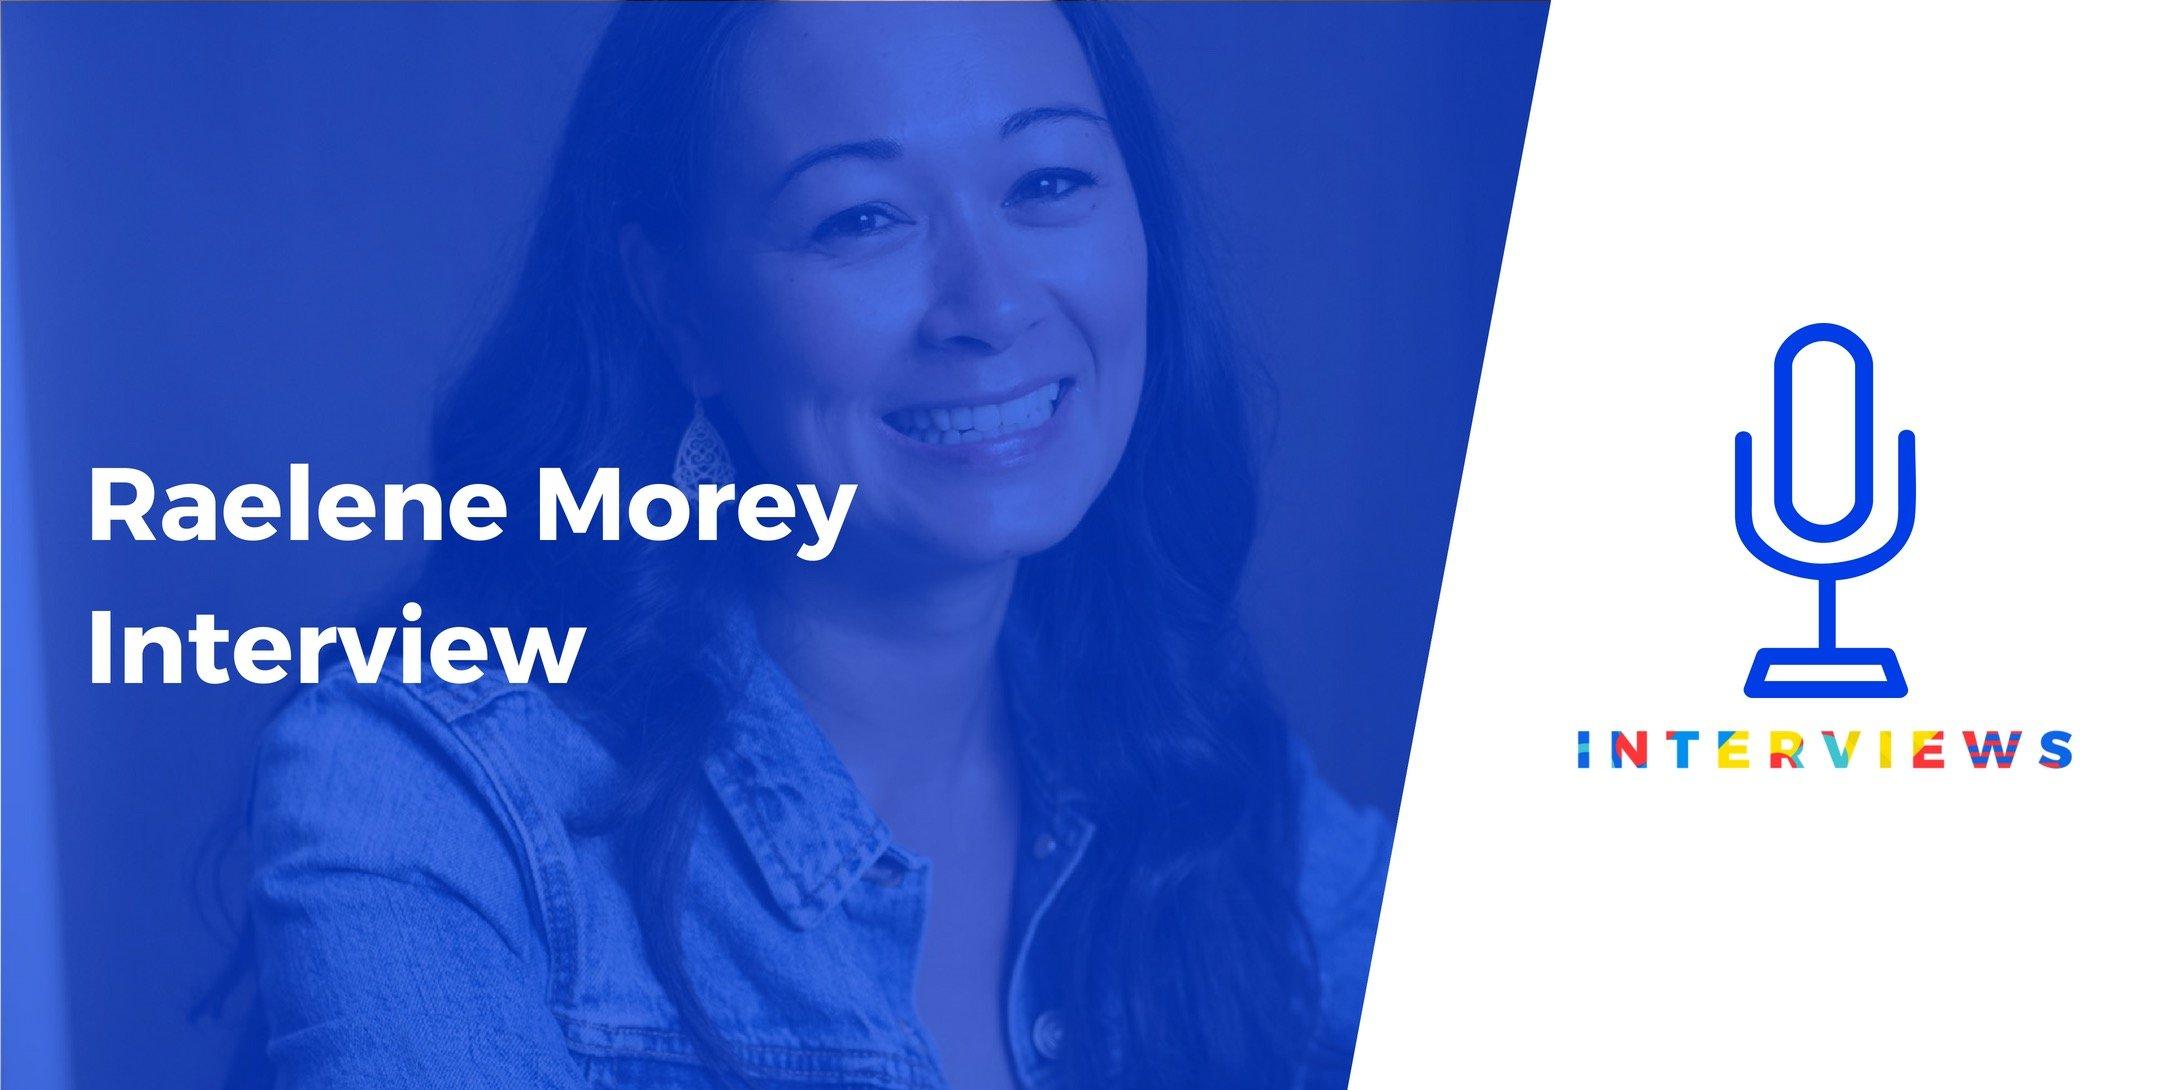 Raelene Morey Interview – Founder of Words By Birds and Former WPMU DEV Editor